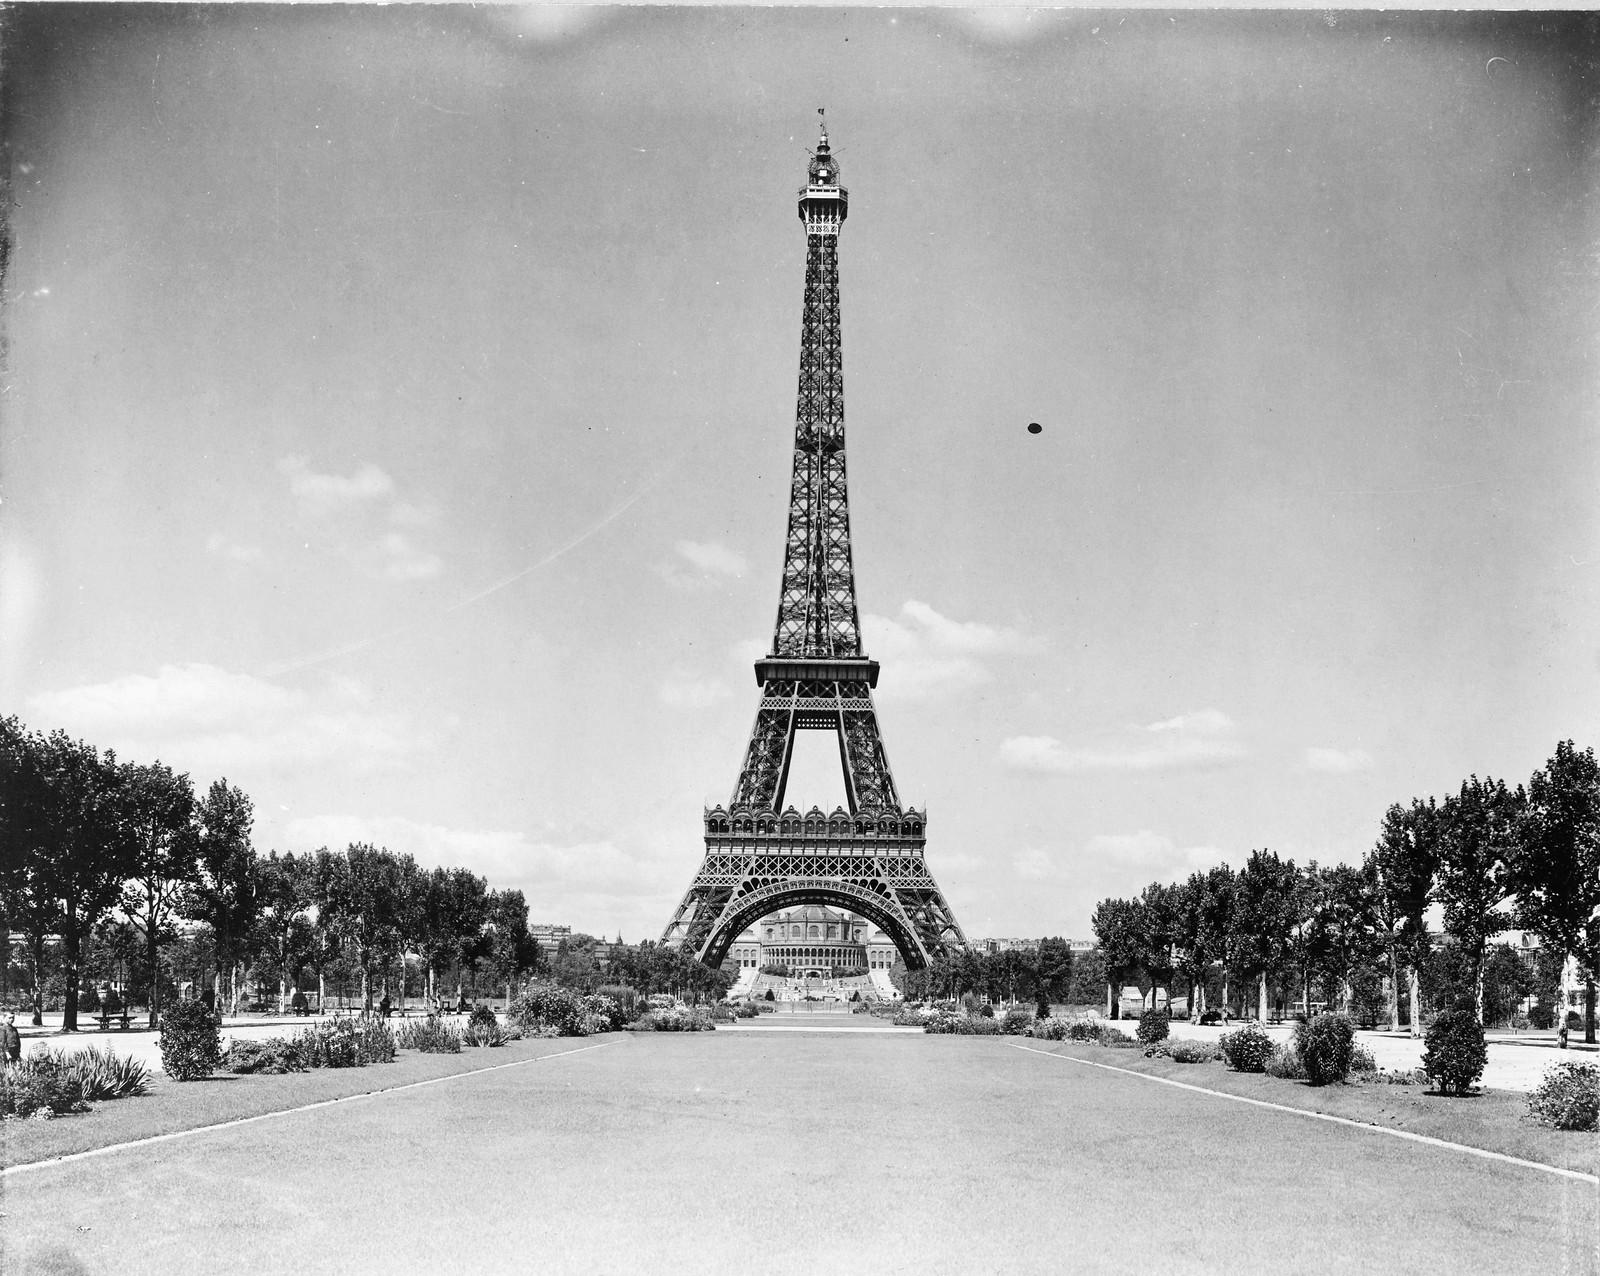 1909. Эйфелева башня и парк